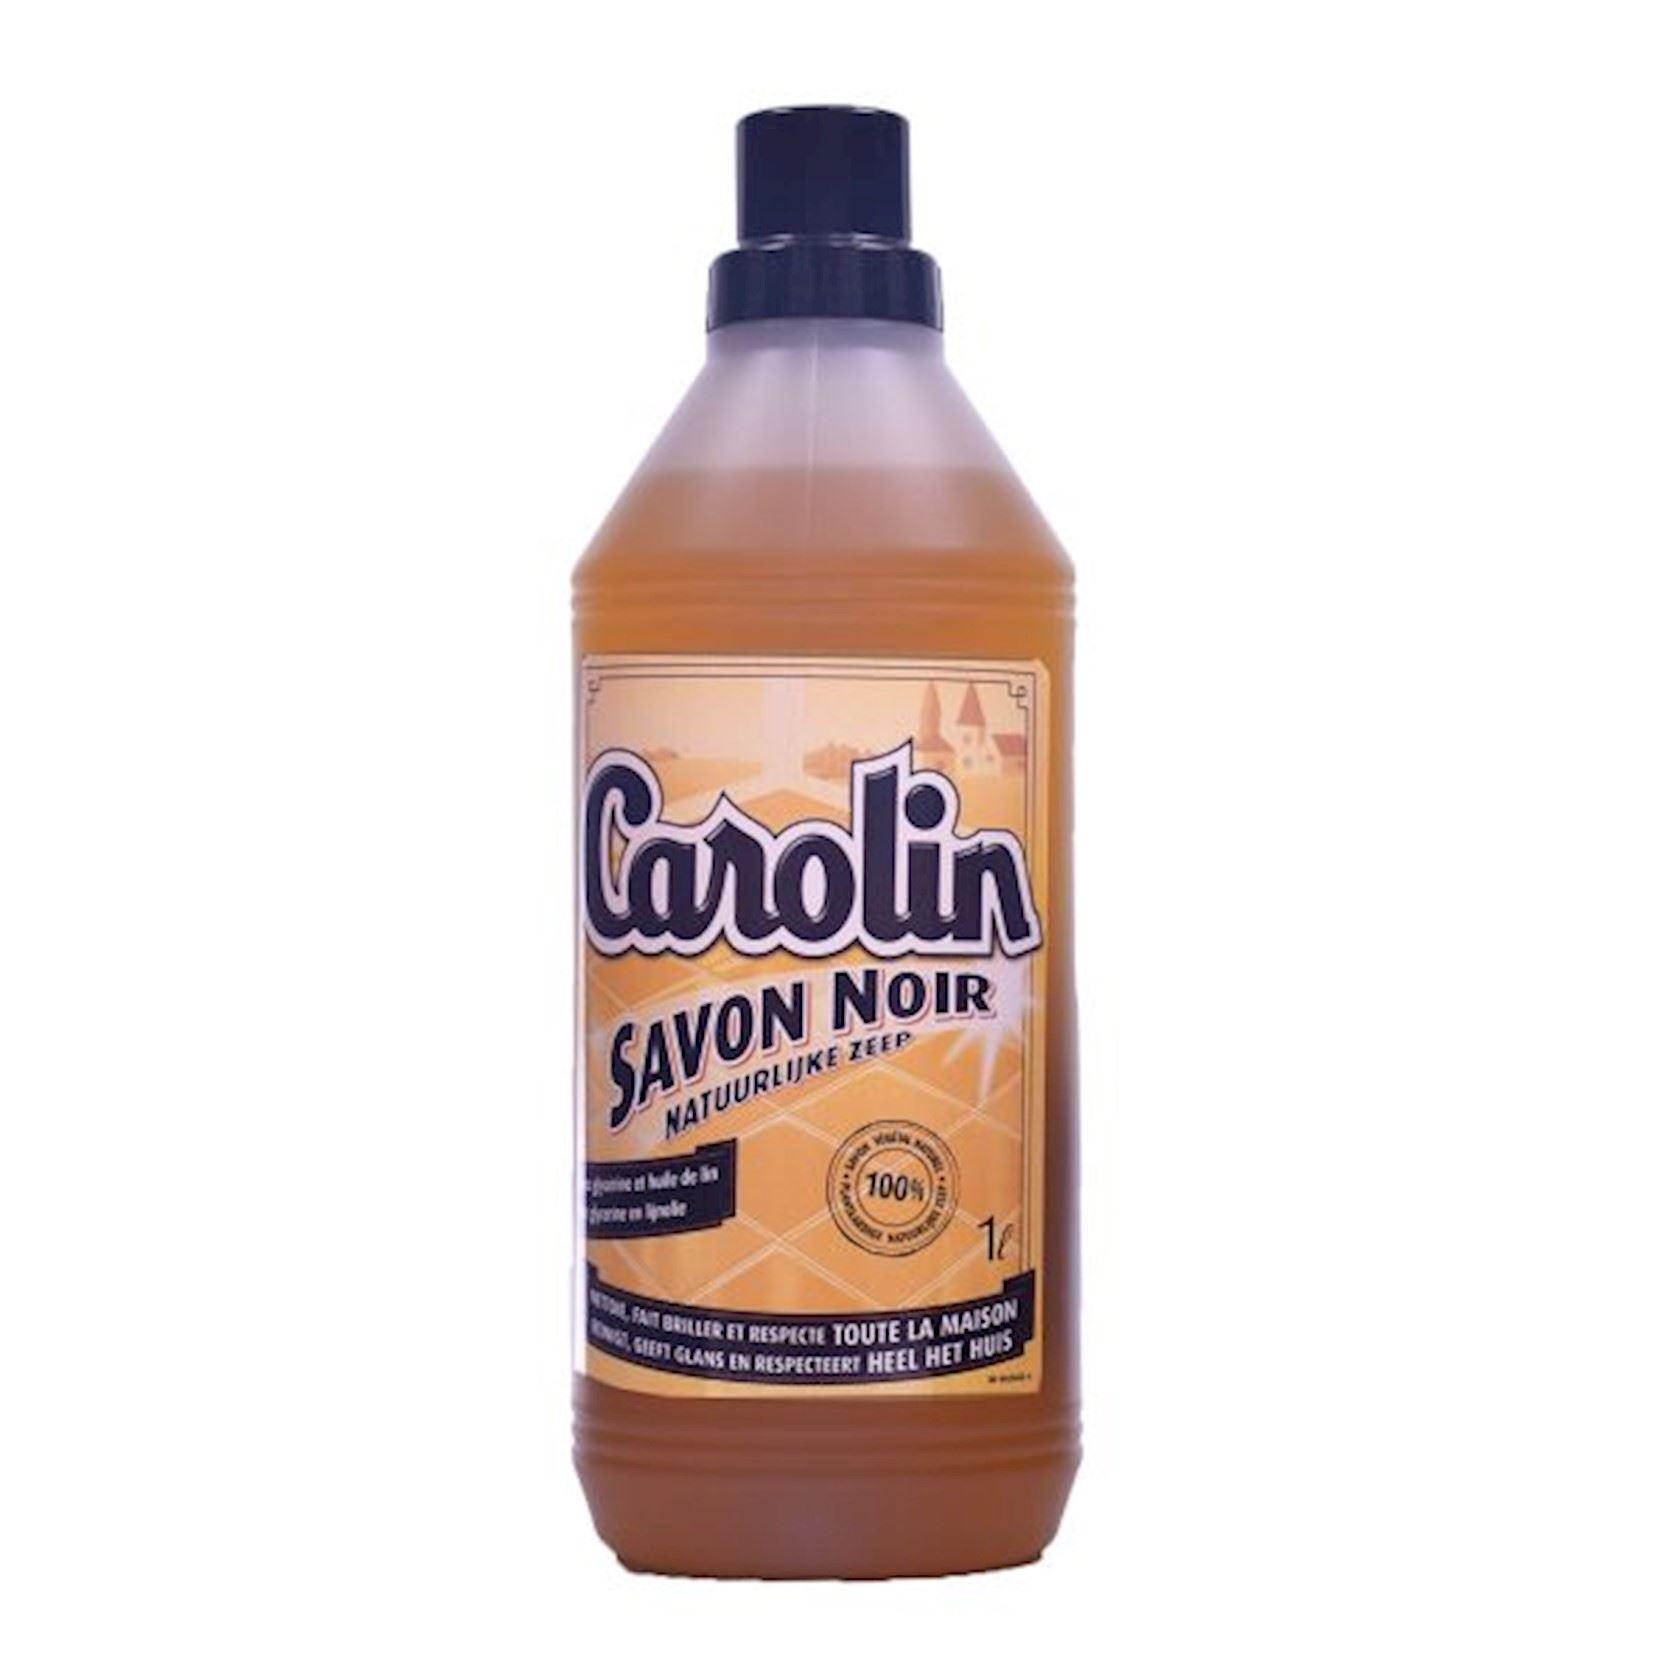 Carolin-vloerreiniger-1l-zwarte-zeep